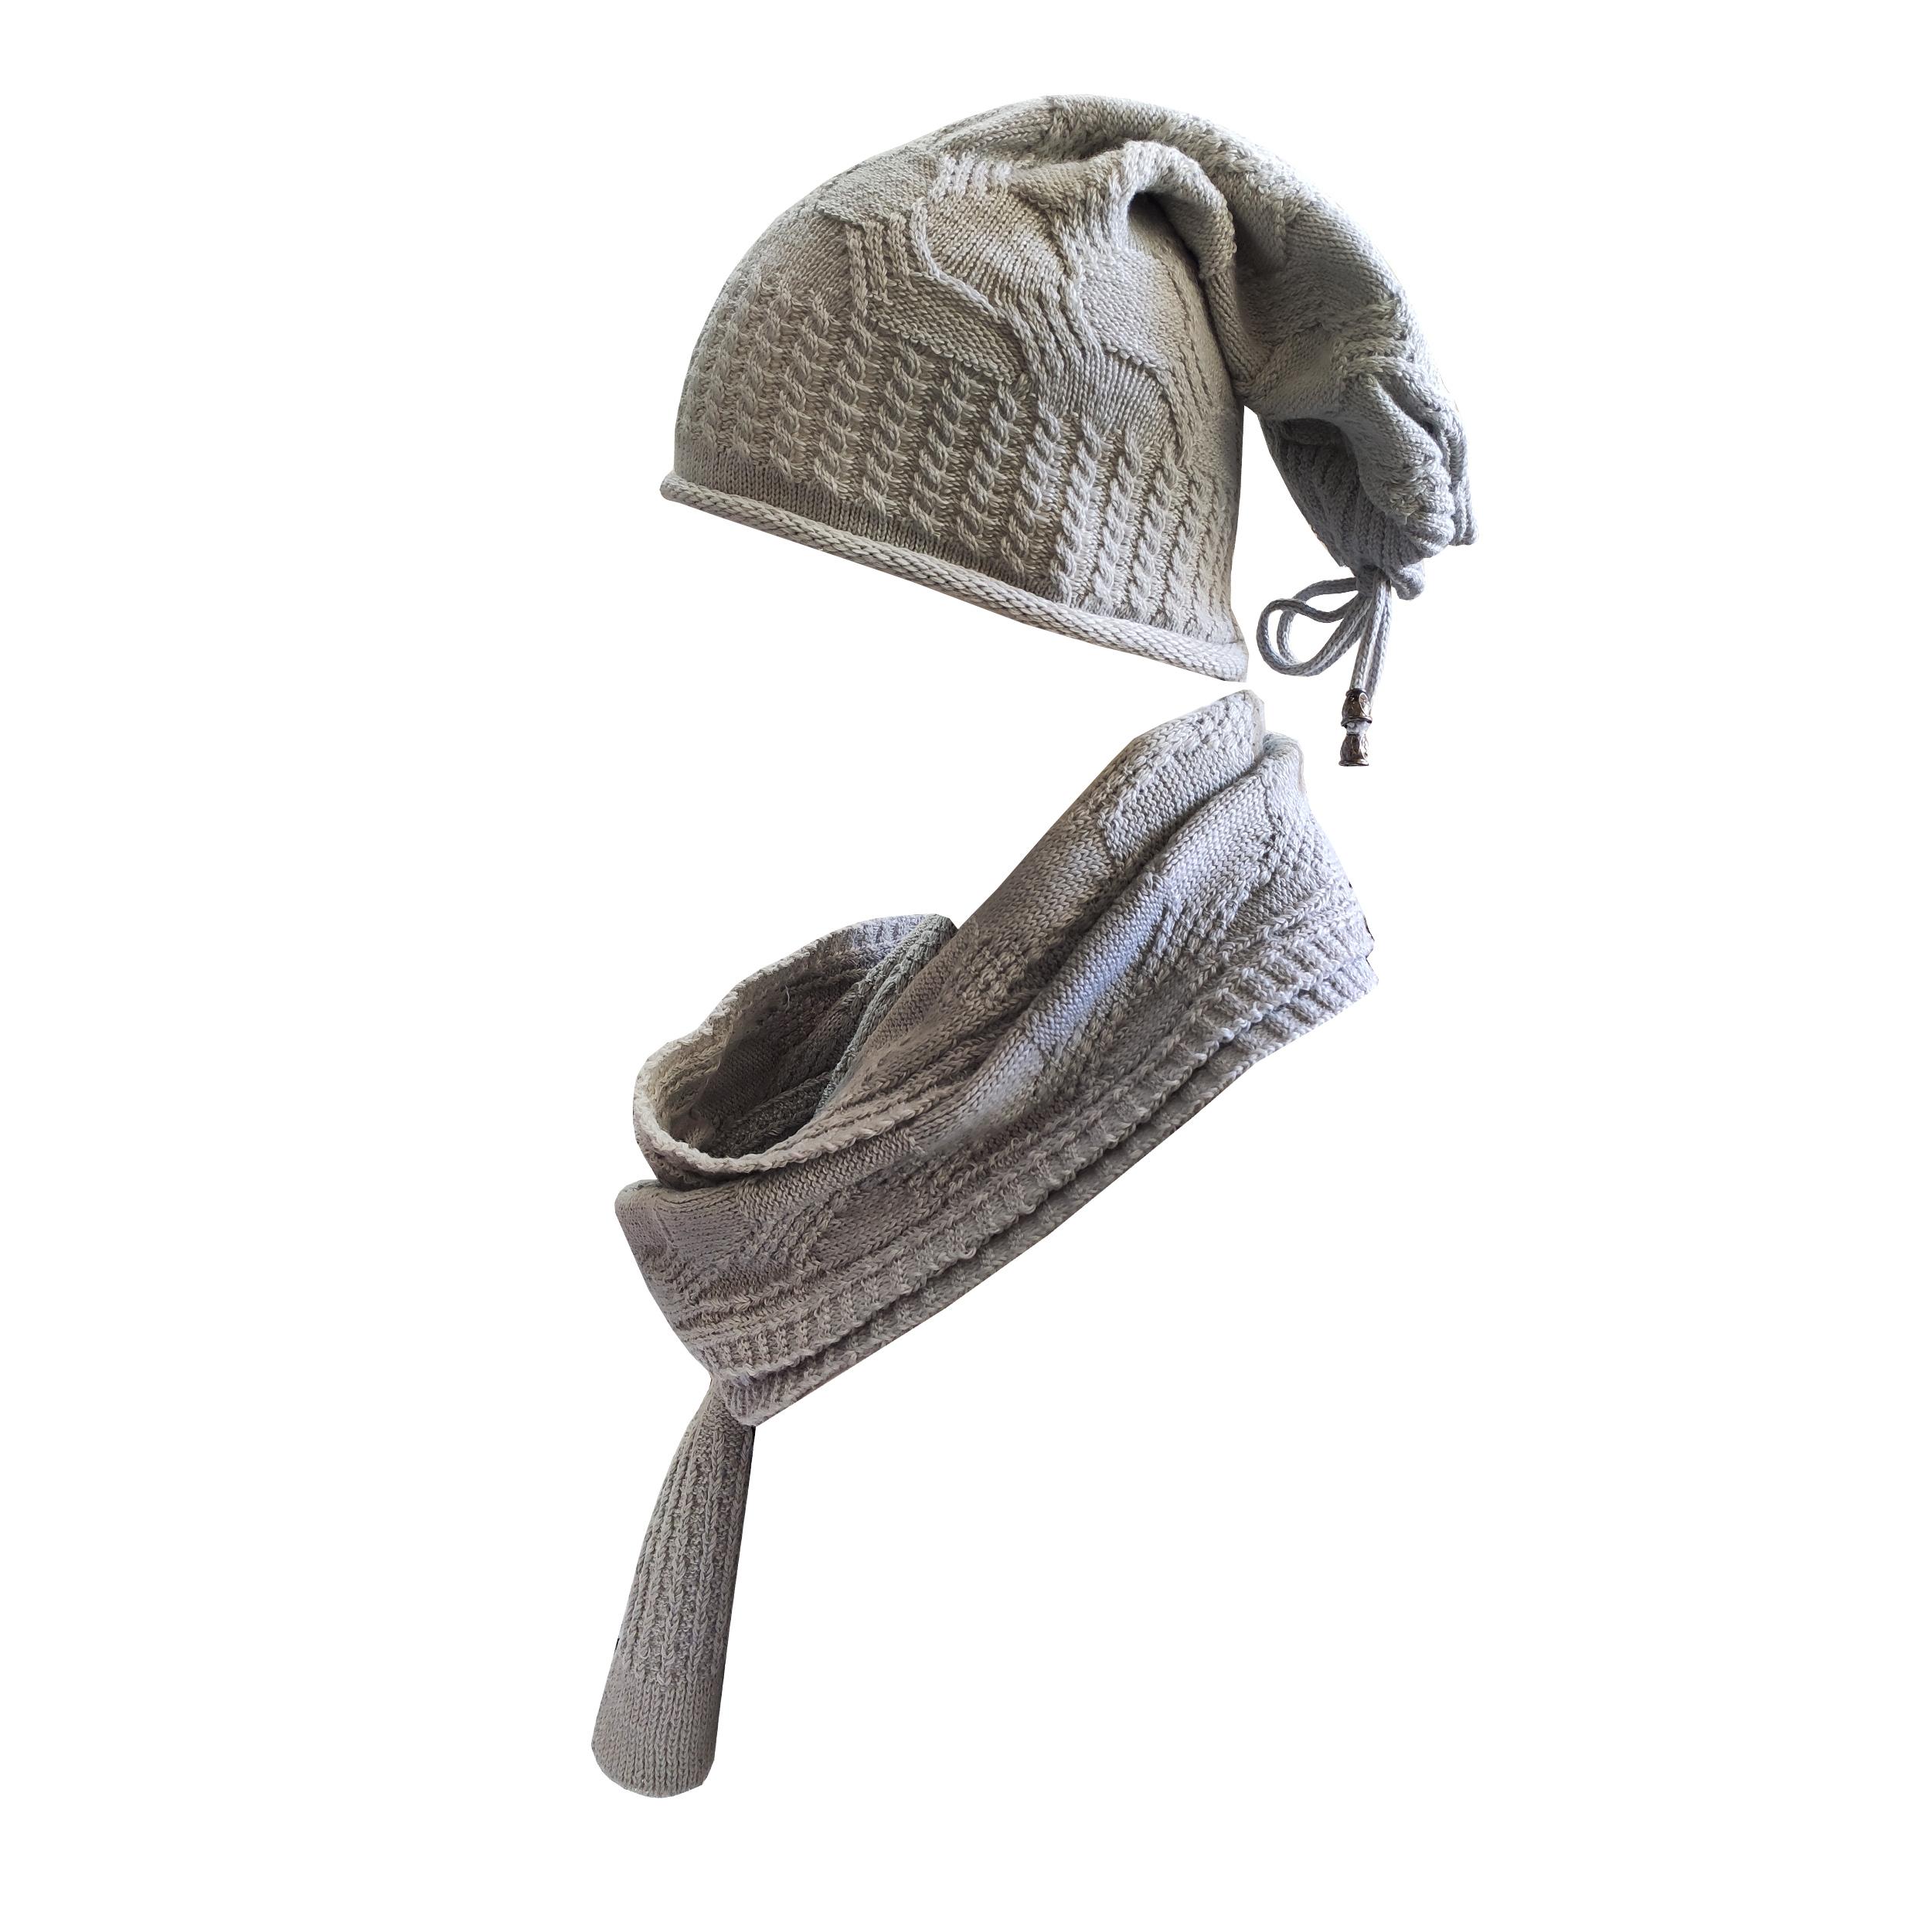 ست کلاه و شال گردن بافتنی پوش آل کد 30657